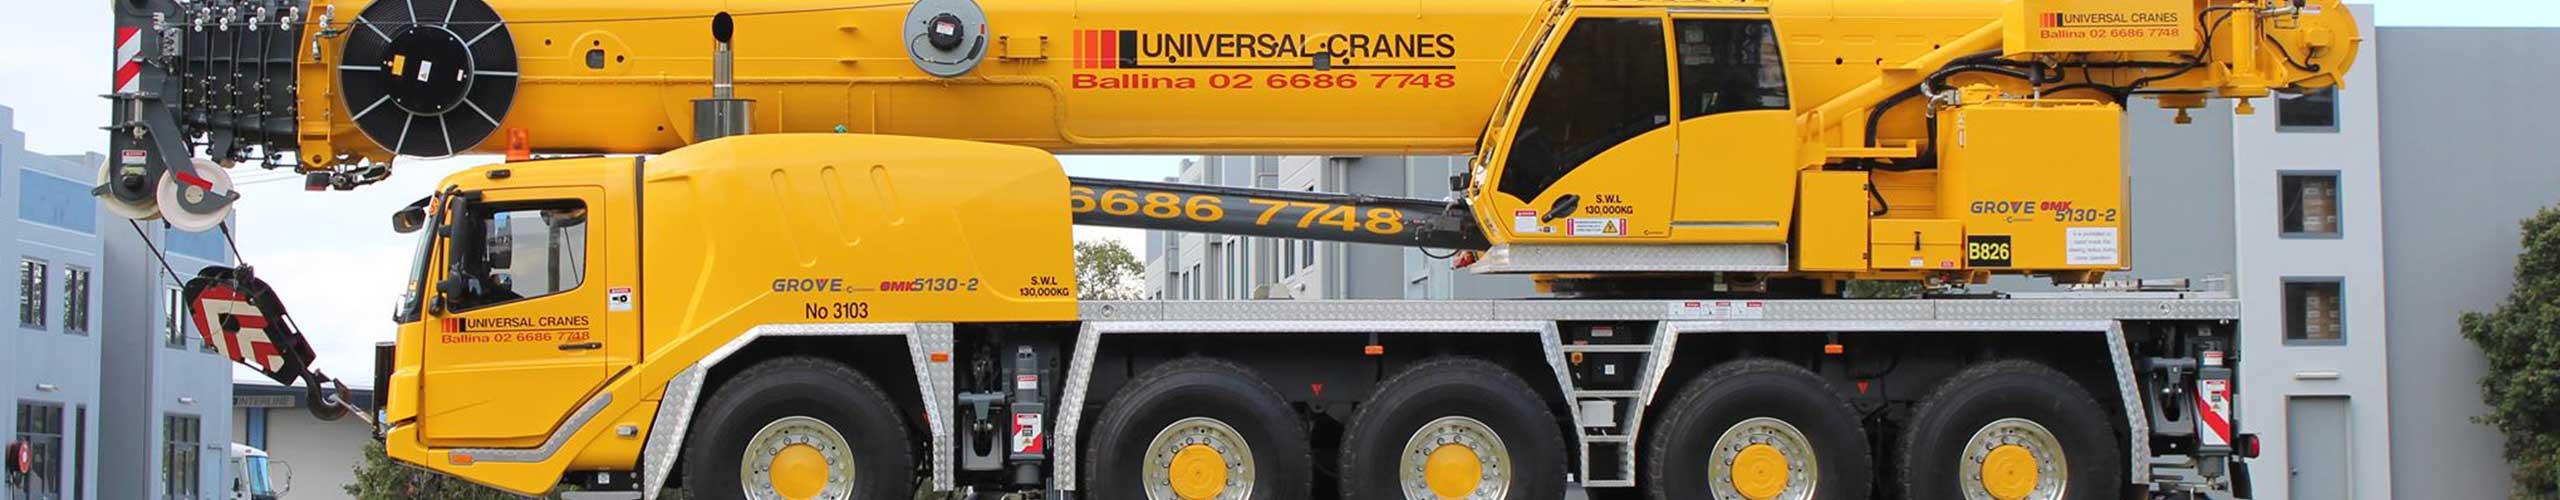 Universal Cranes Ballina